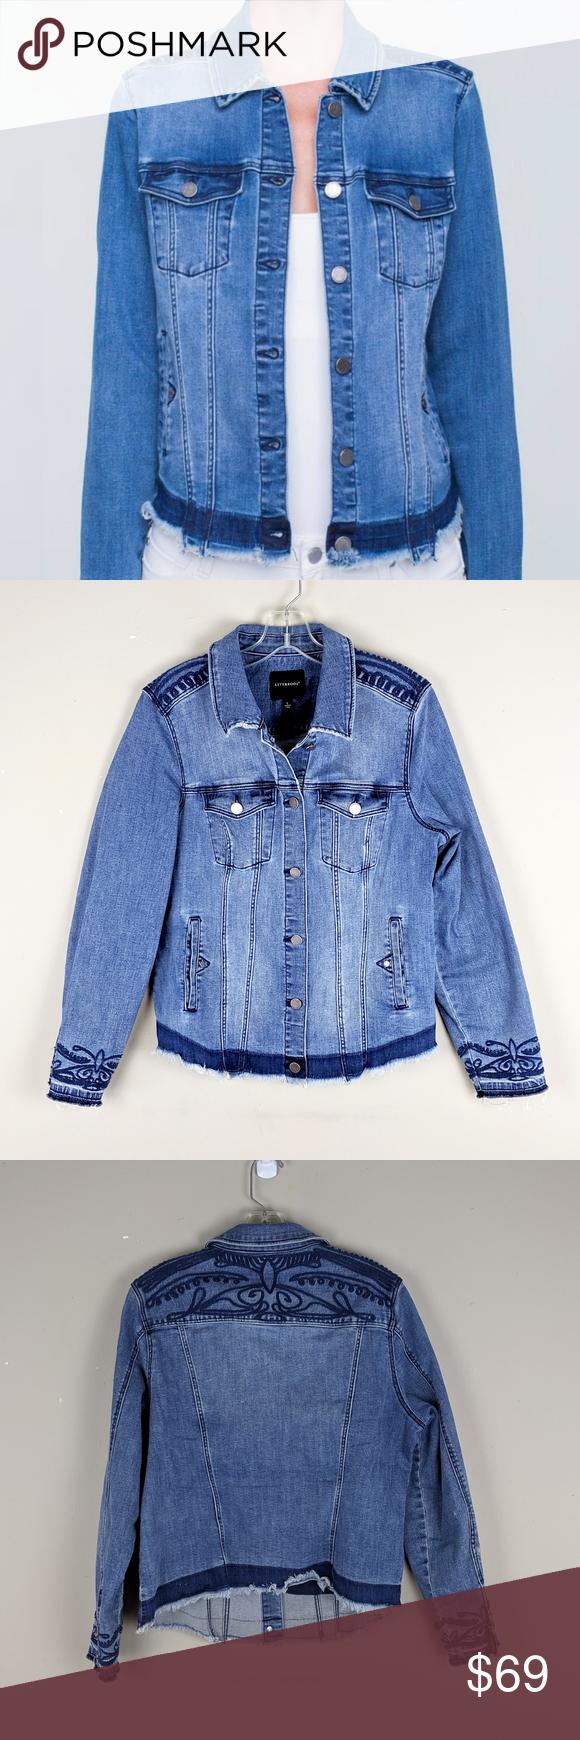 Liverpool Embroidered Boho Denim Jacket E60 Boho Denim Boho Style Jackets Trendy Denim [ 1740 x 580 Pixel ]